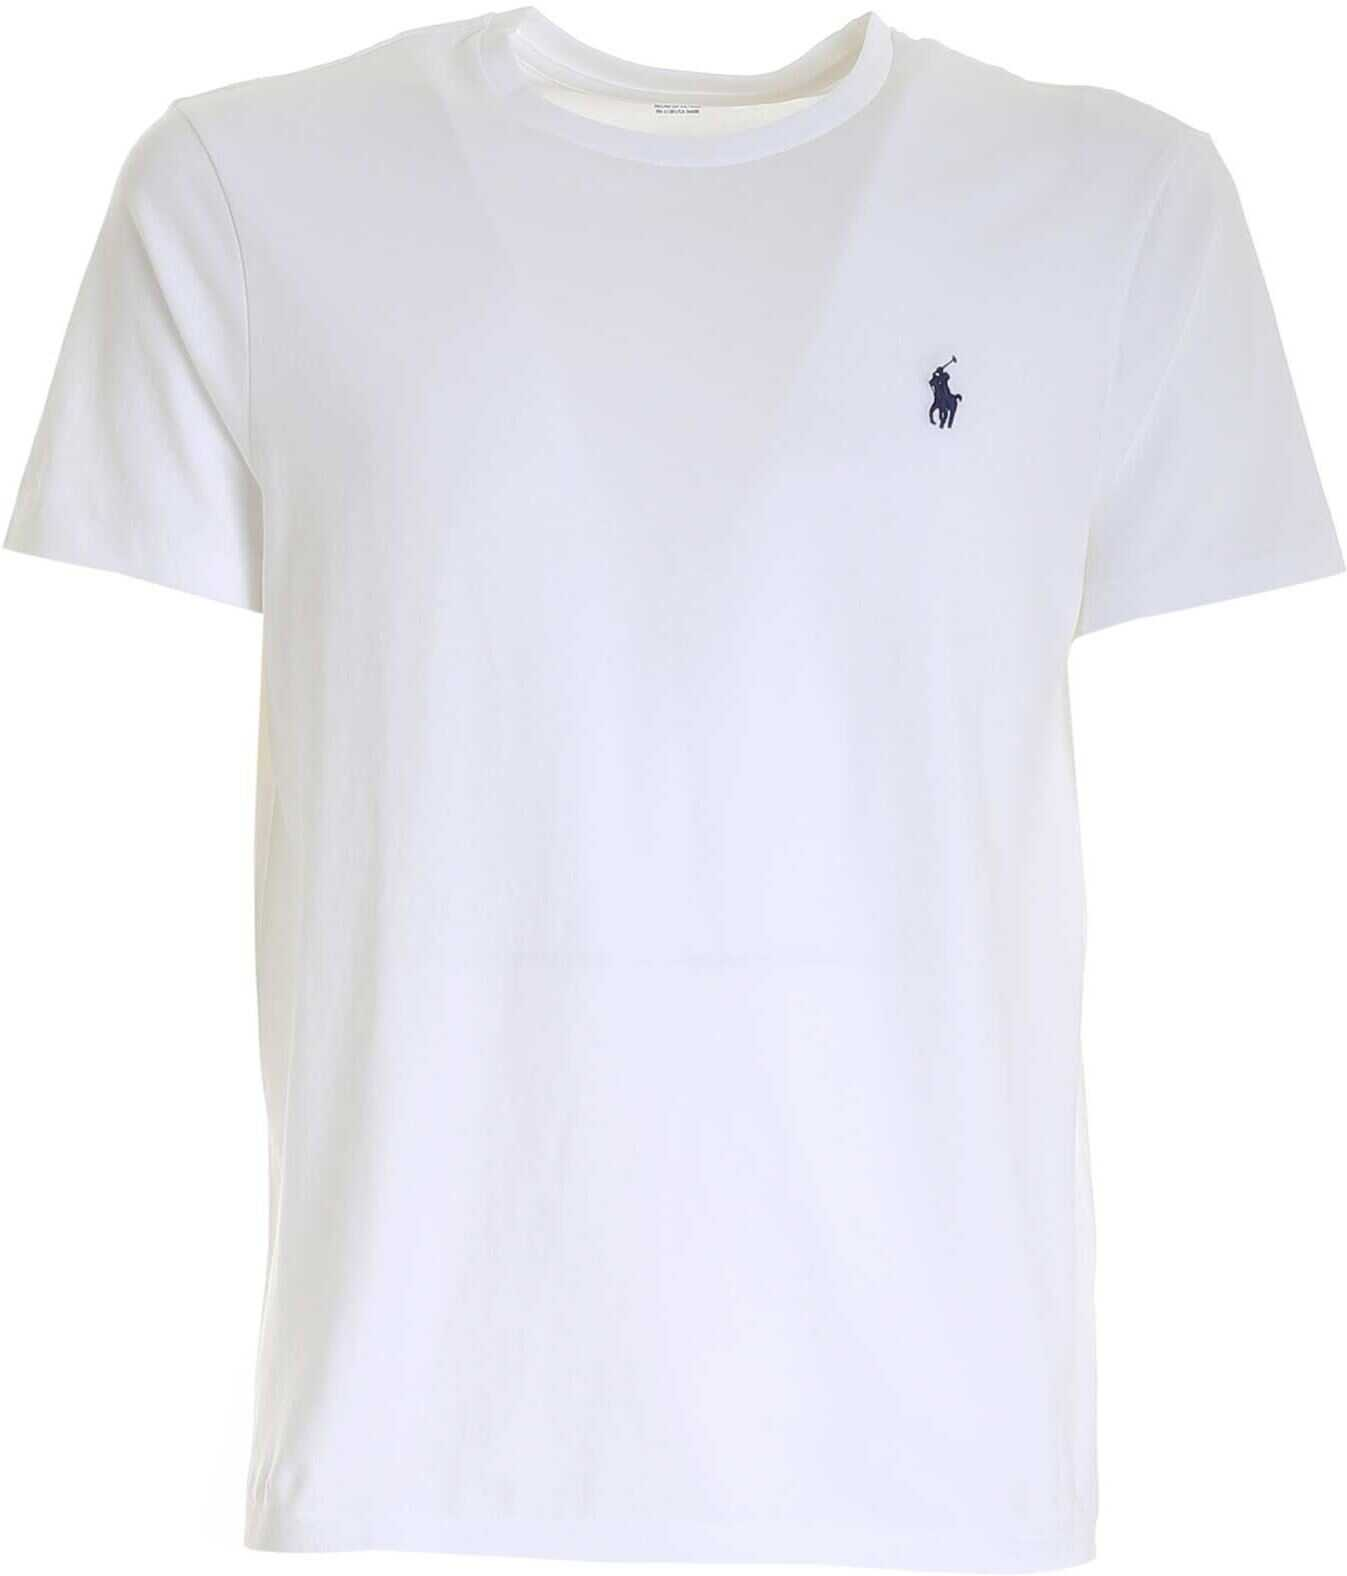 Ralph Lauren White T-Shirt With Blue Logo White